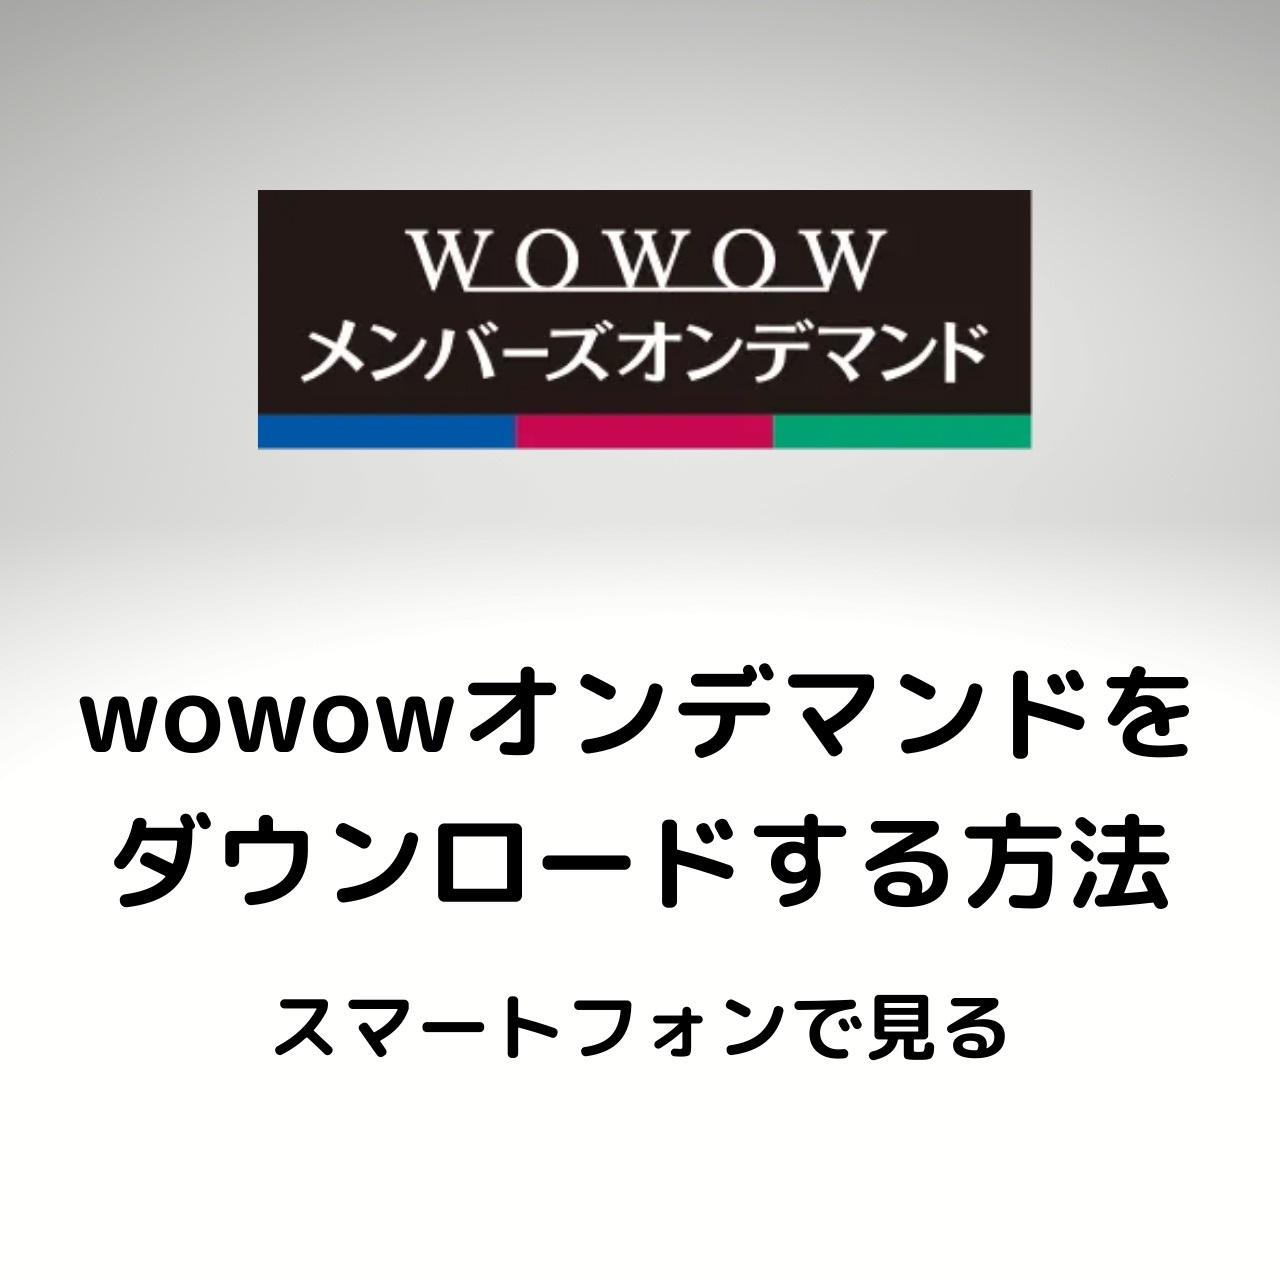 wowowオンデマンドをダウンロードする方法 スマートフォンで見る